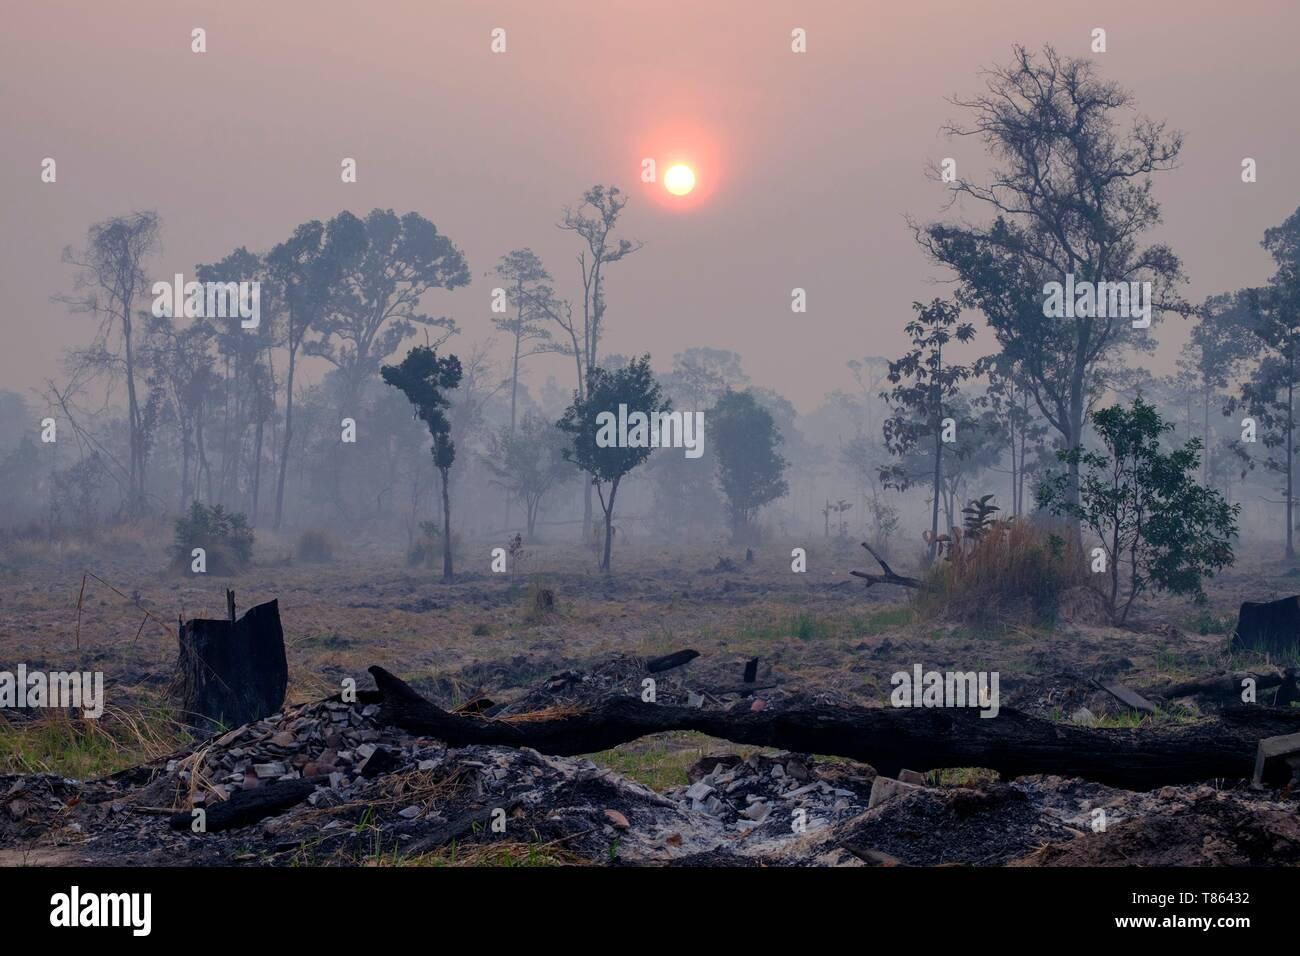 Cambodia, Preah Vihear province, near Sra Em, devastated landscape ...